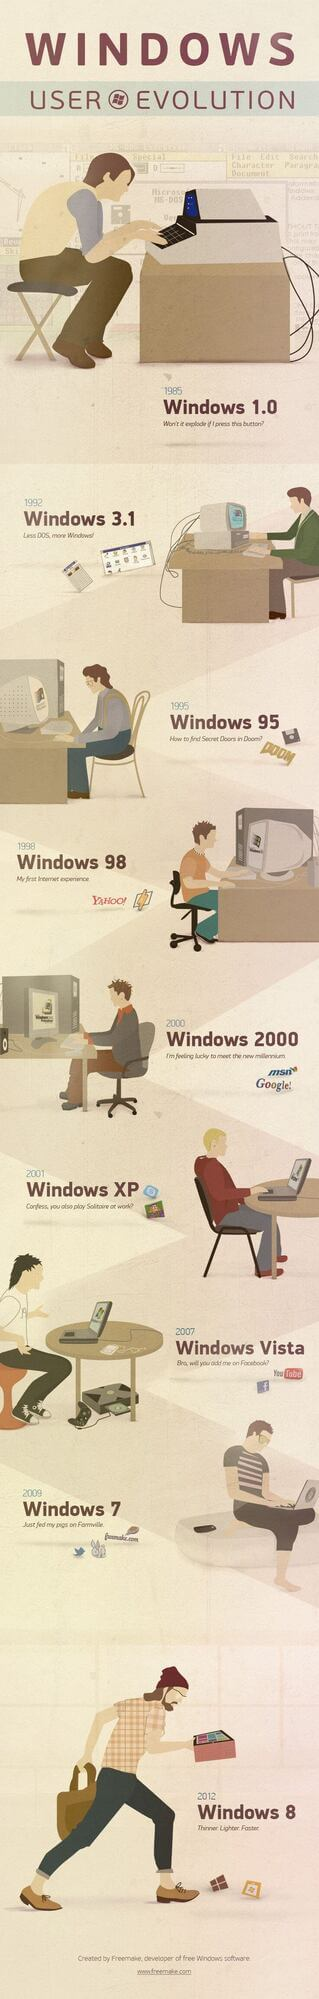 Windows User Evolution